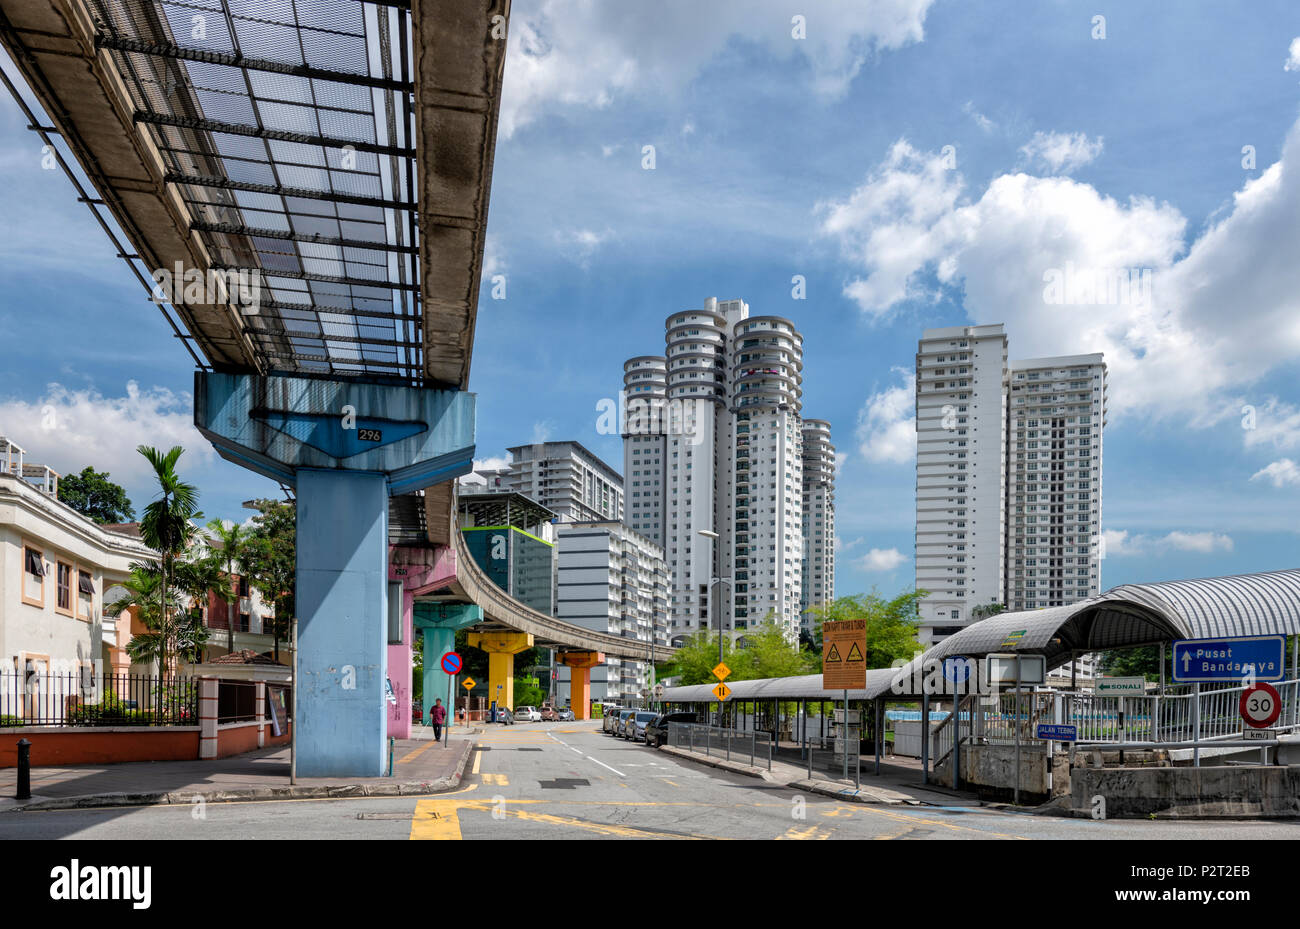 A monorail heading into Kuala Lumpur city centre. Kuala Lumpur, Malaysia Stock Photo